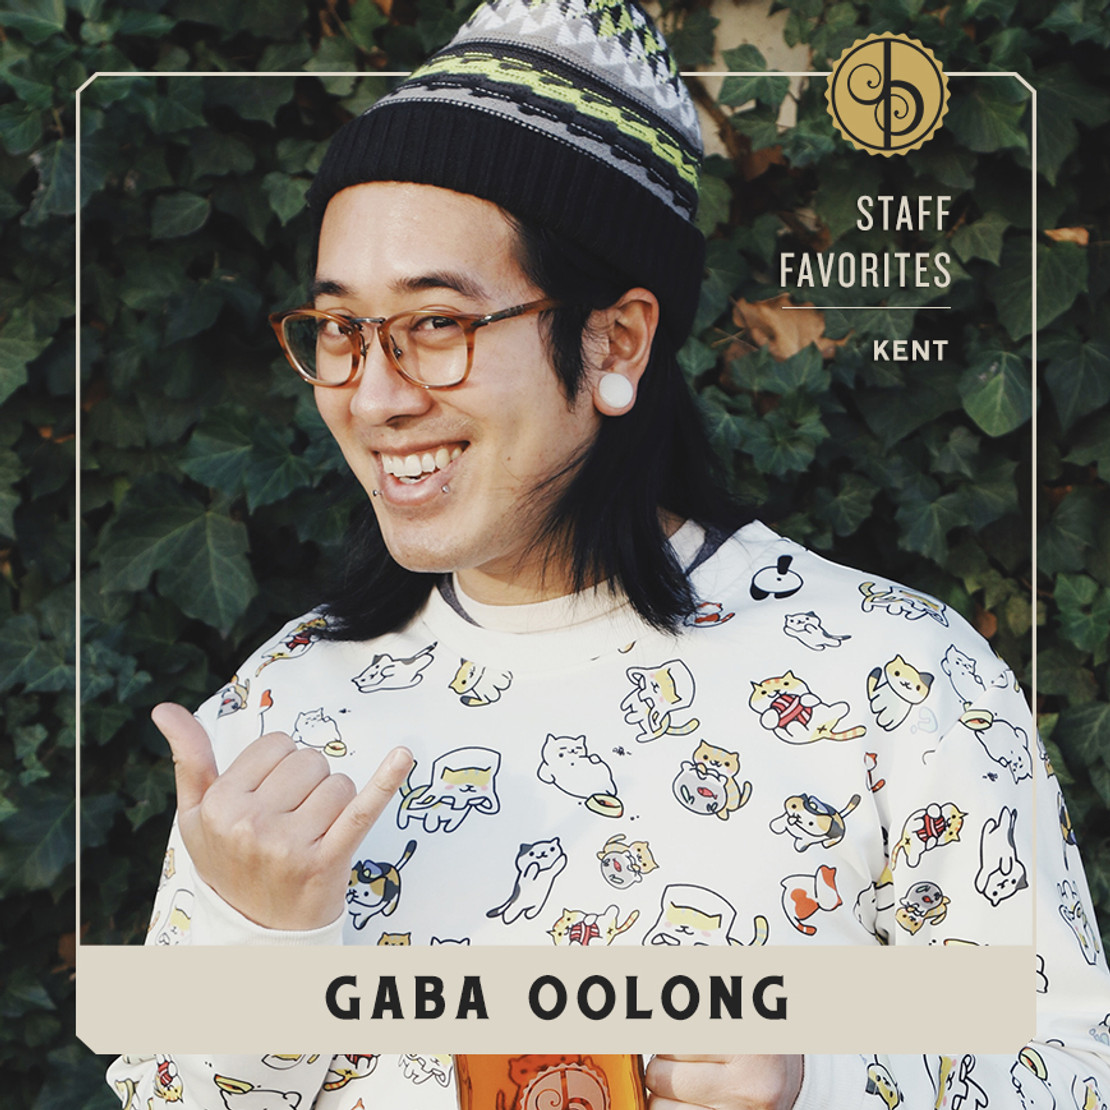 Staff Favorites: Kent and Gaba Oolong